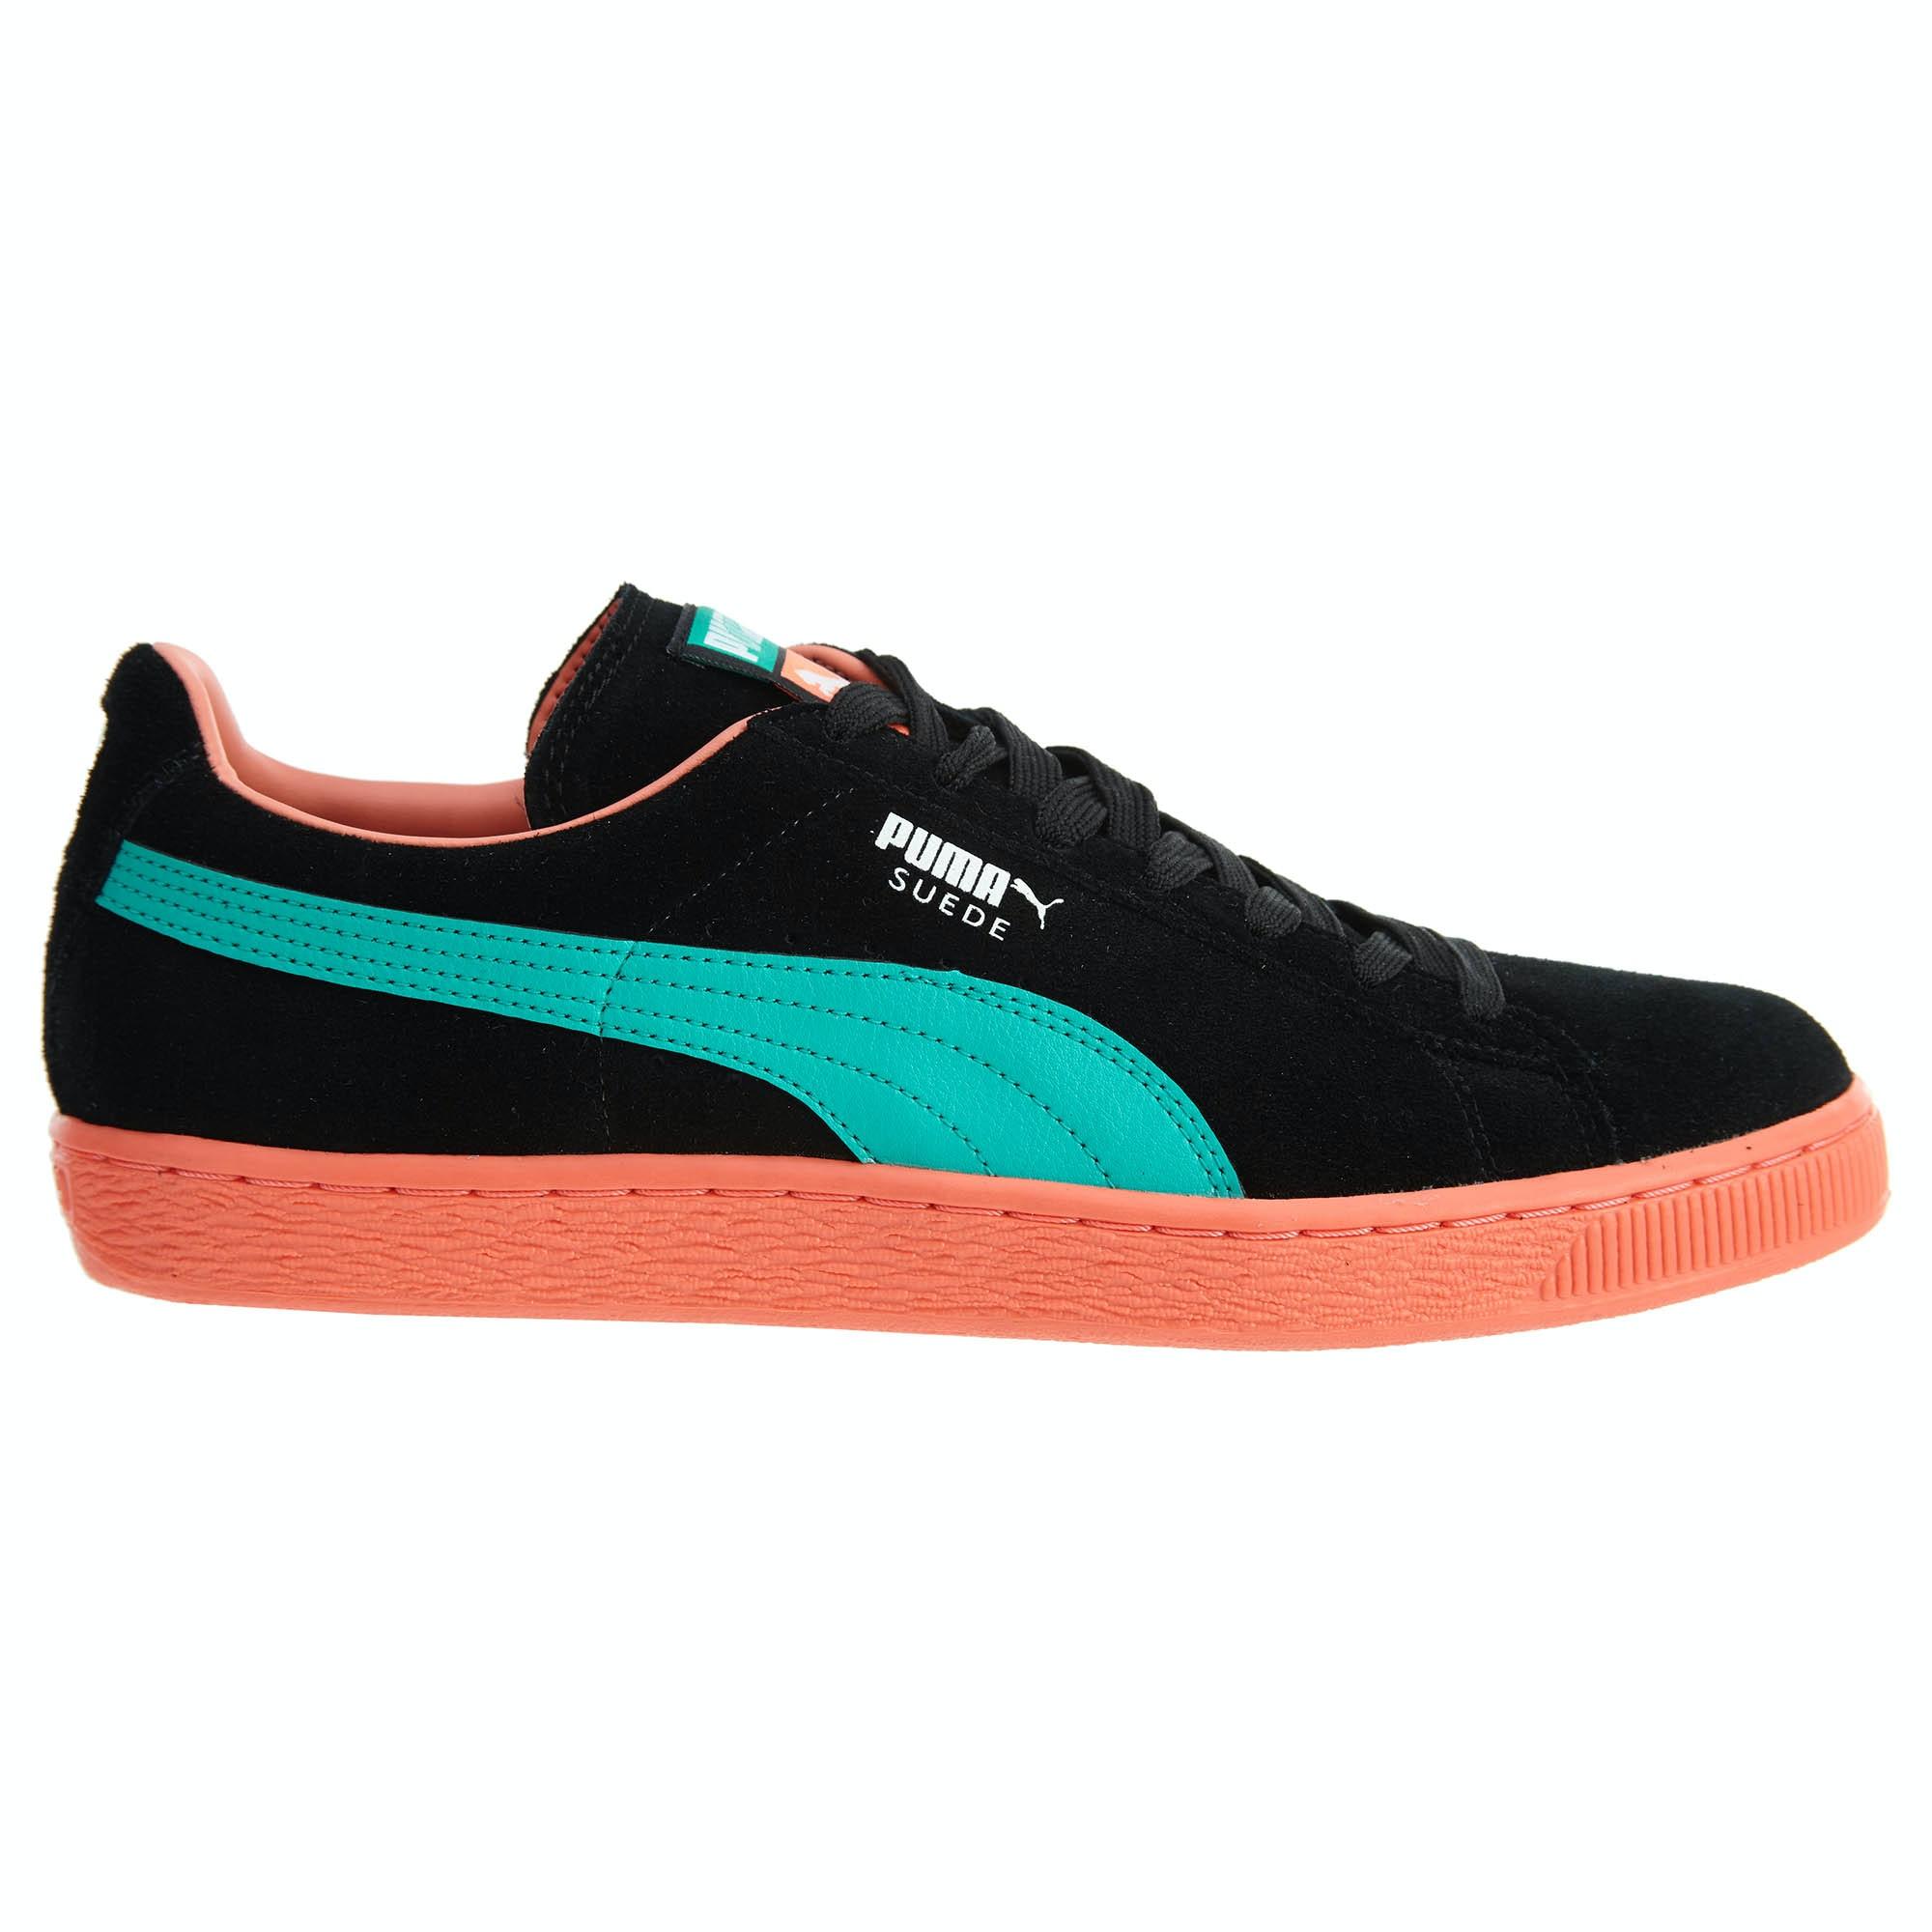 Puma Suede Classic Lfs Black/Fluo Teal/Fluo Peach